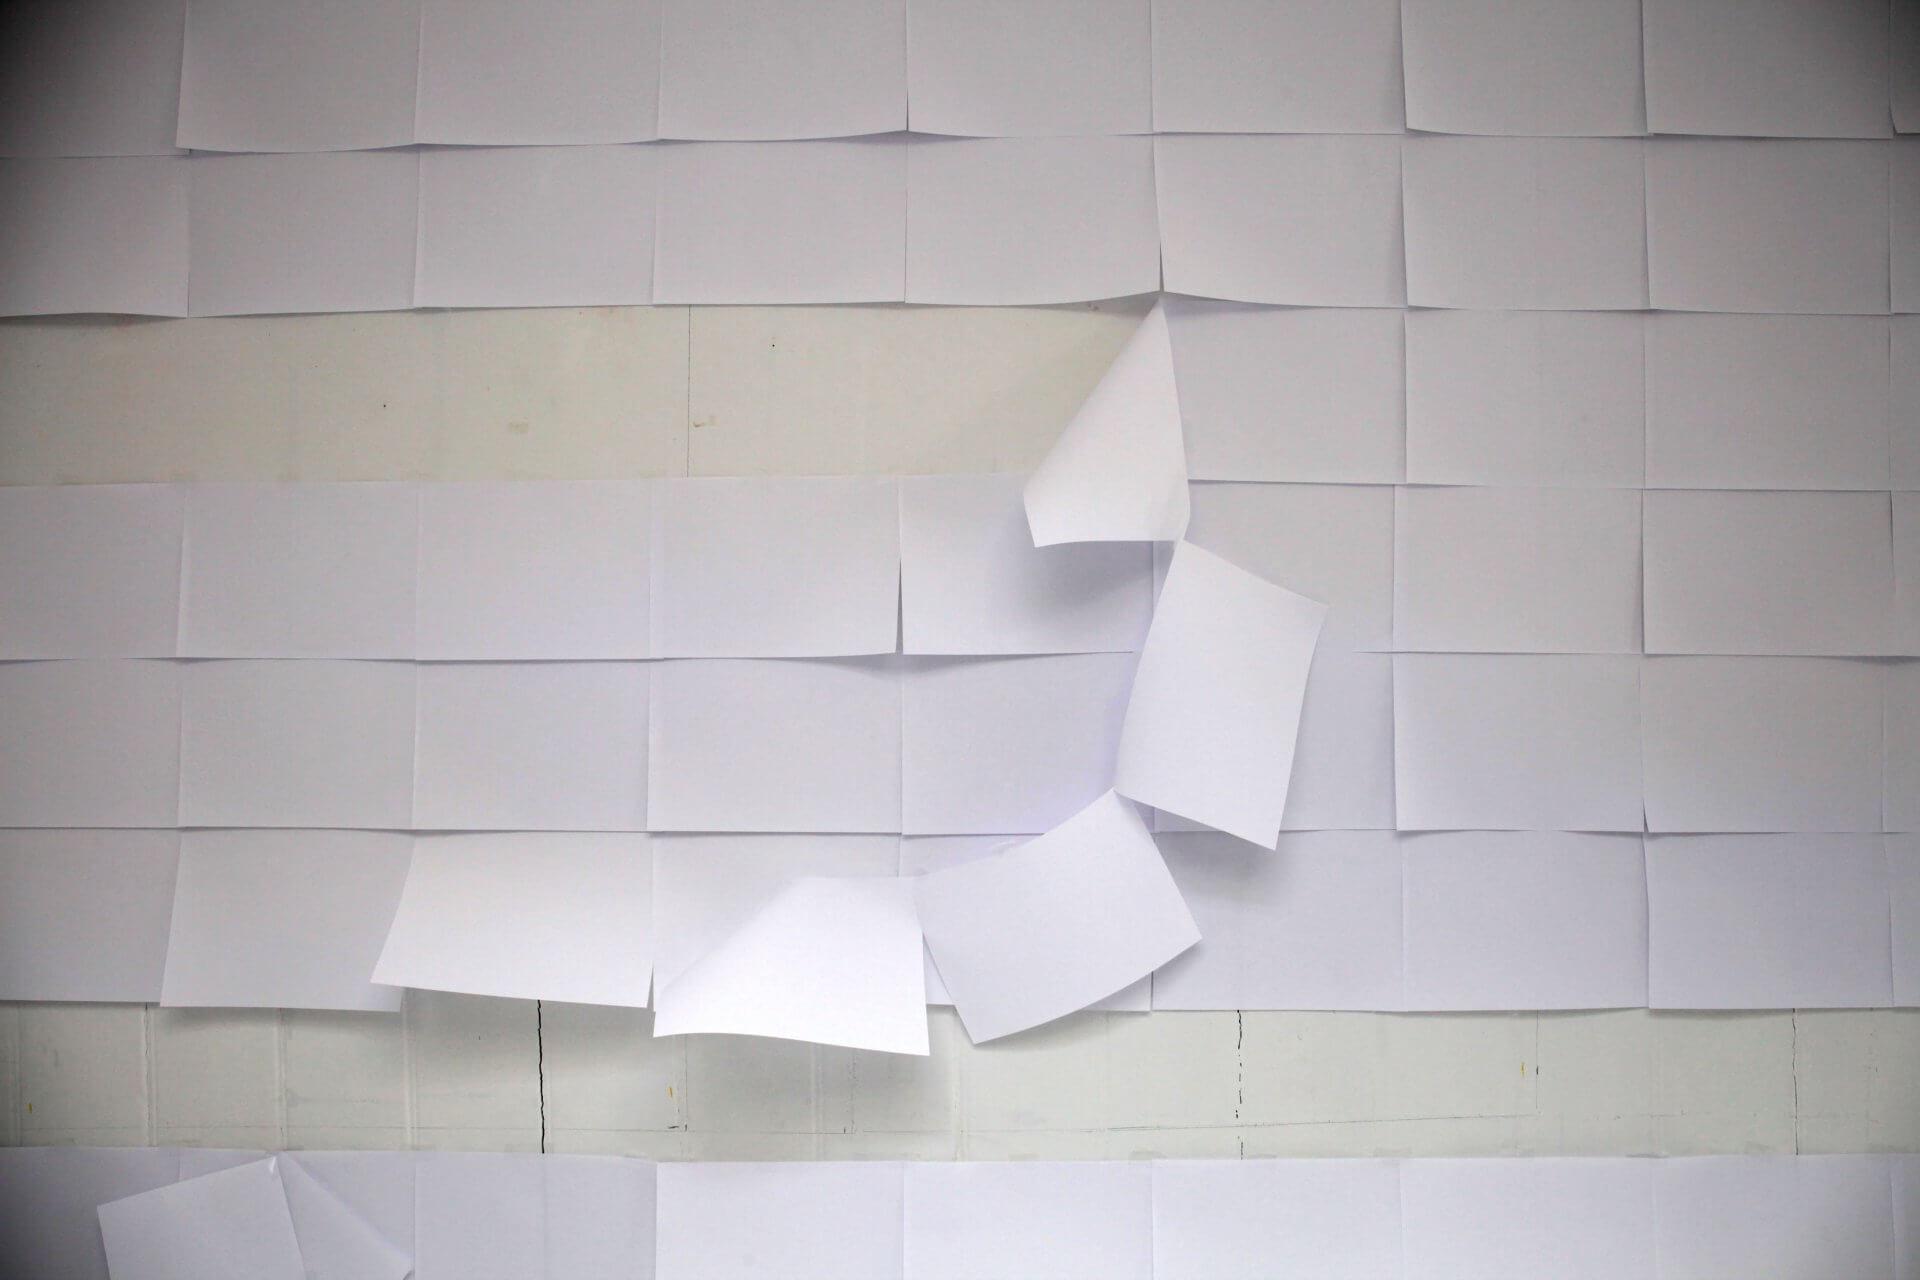 Papir Rum (2015), Malene Nors Tardrup